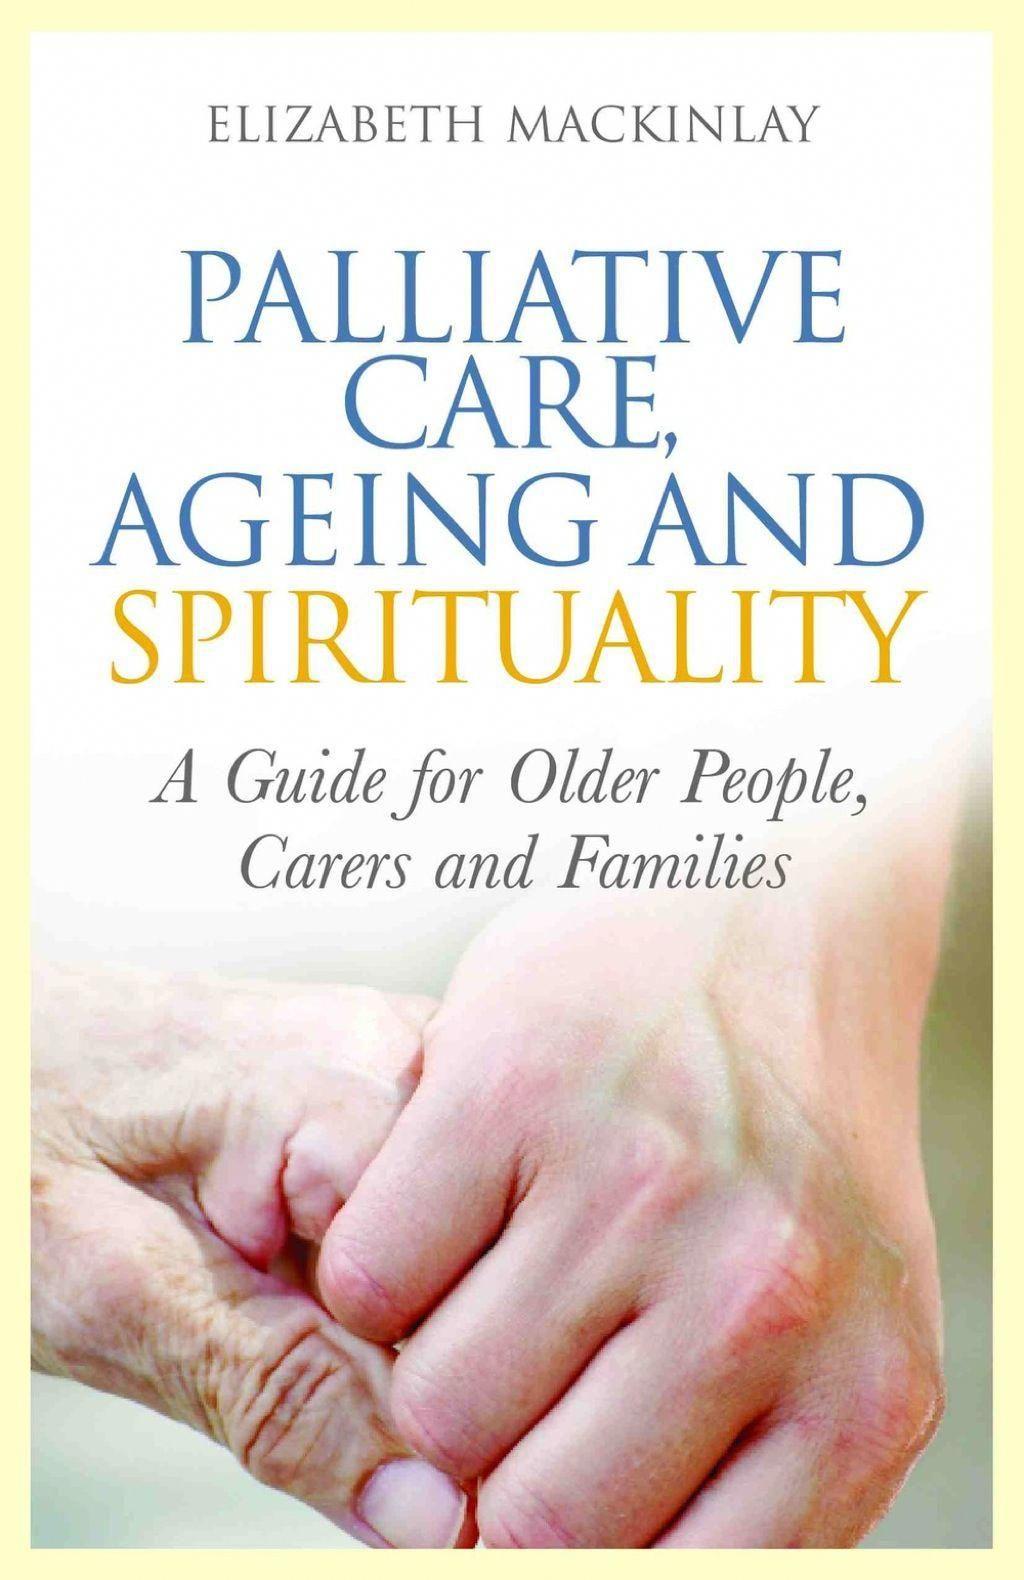 Palliative care ageing and spirituality ebook